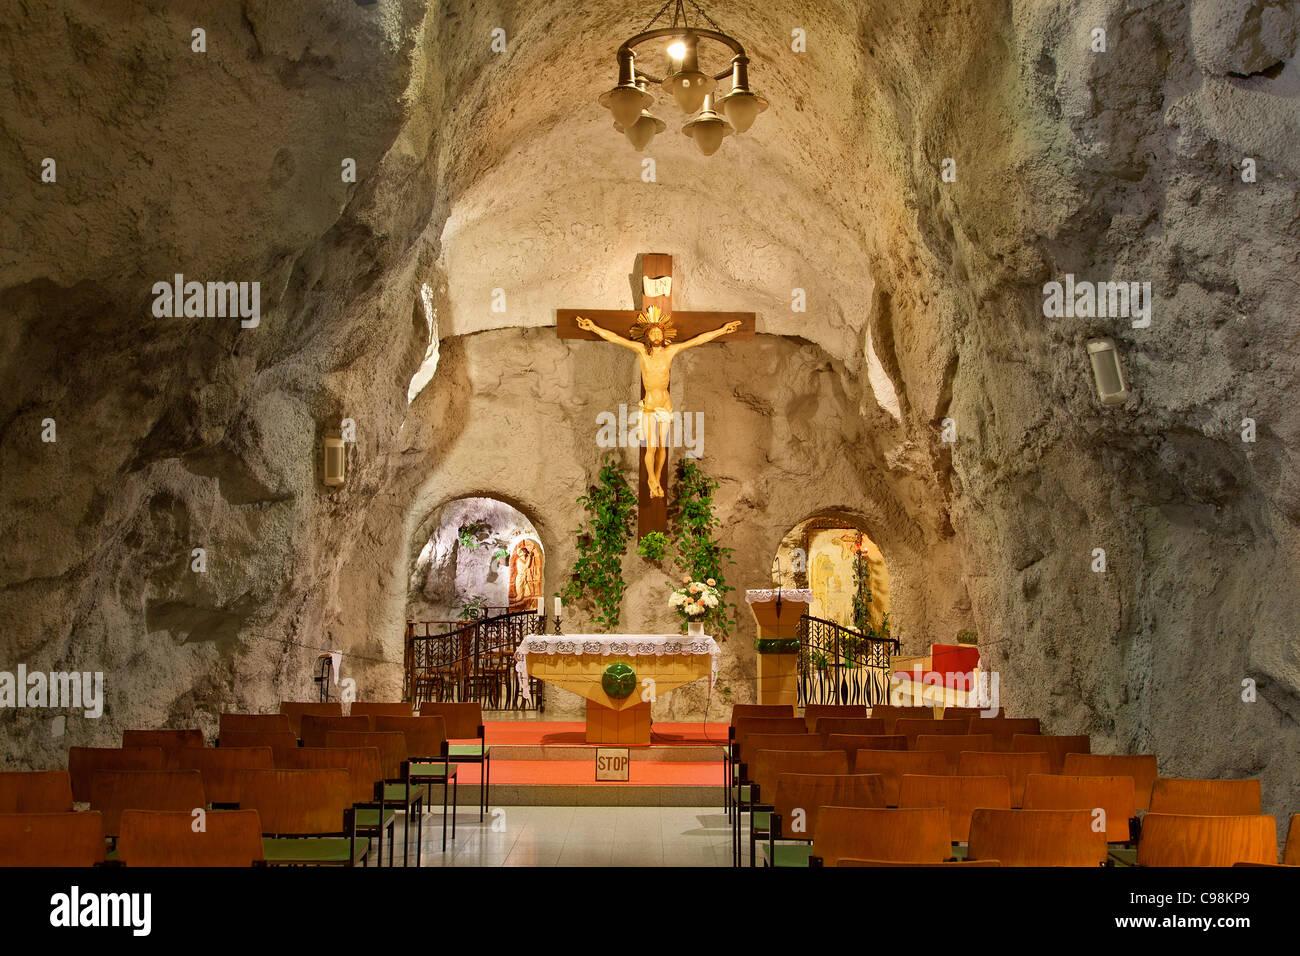 Budapest, Cave Church on Gellert Hill - Stock Image